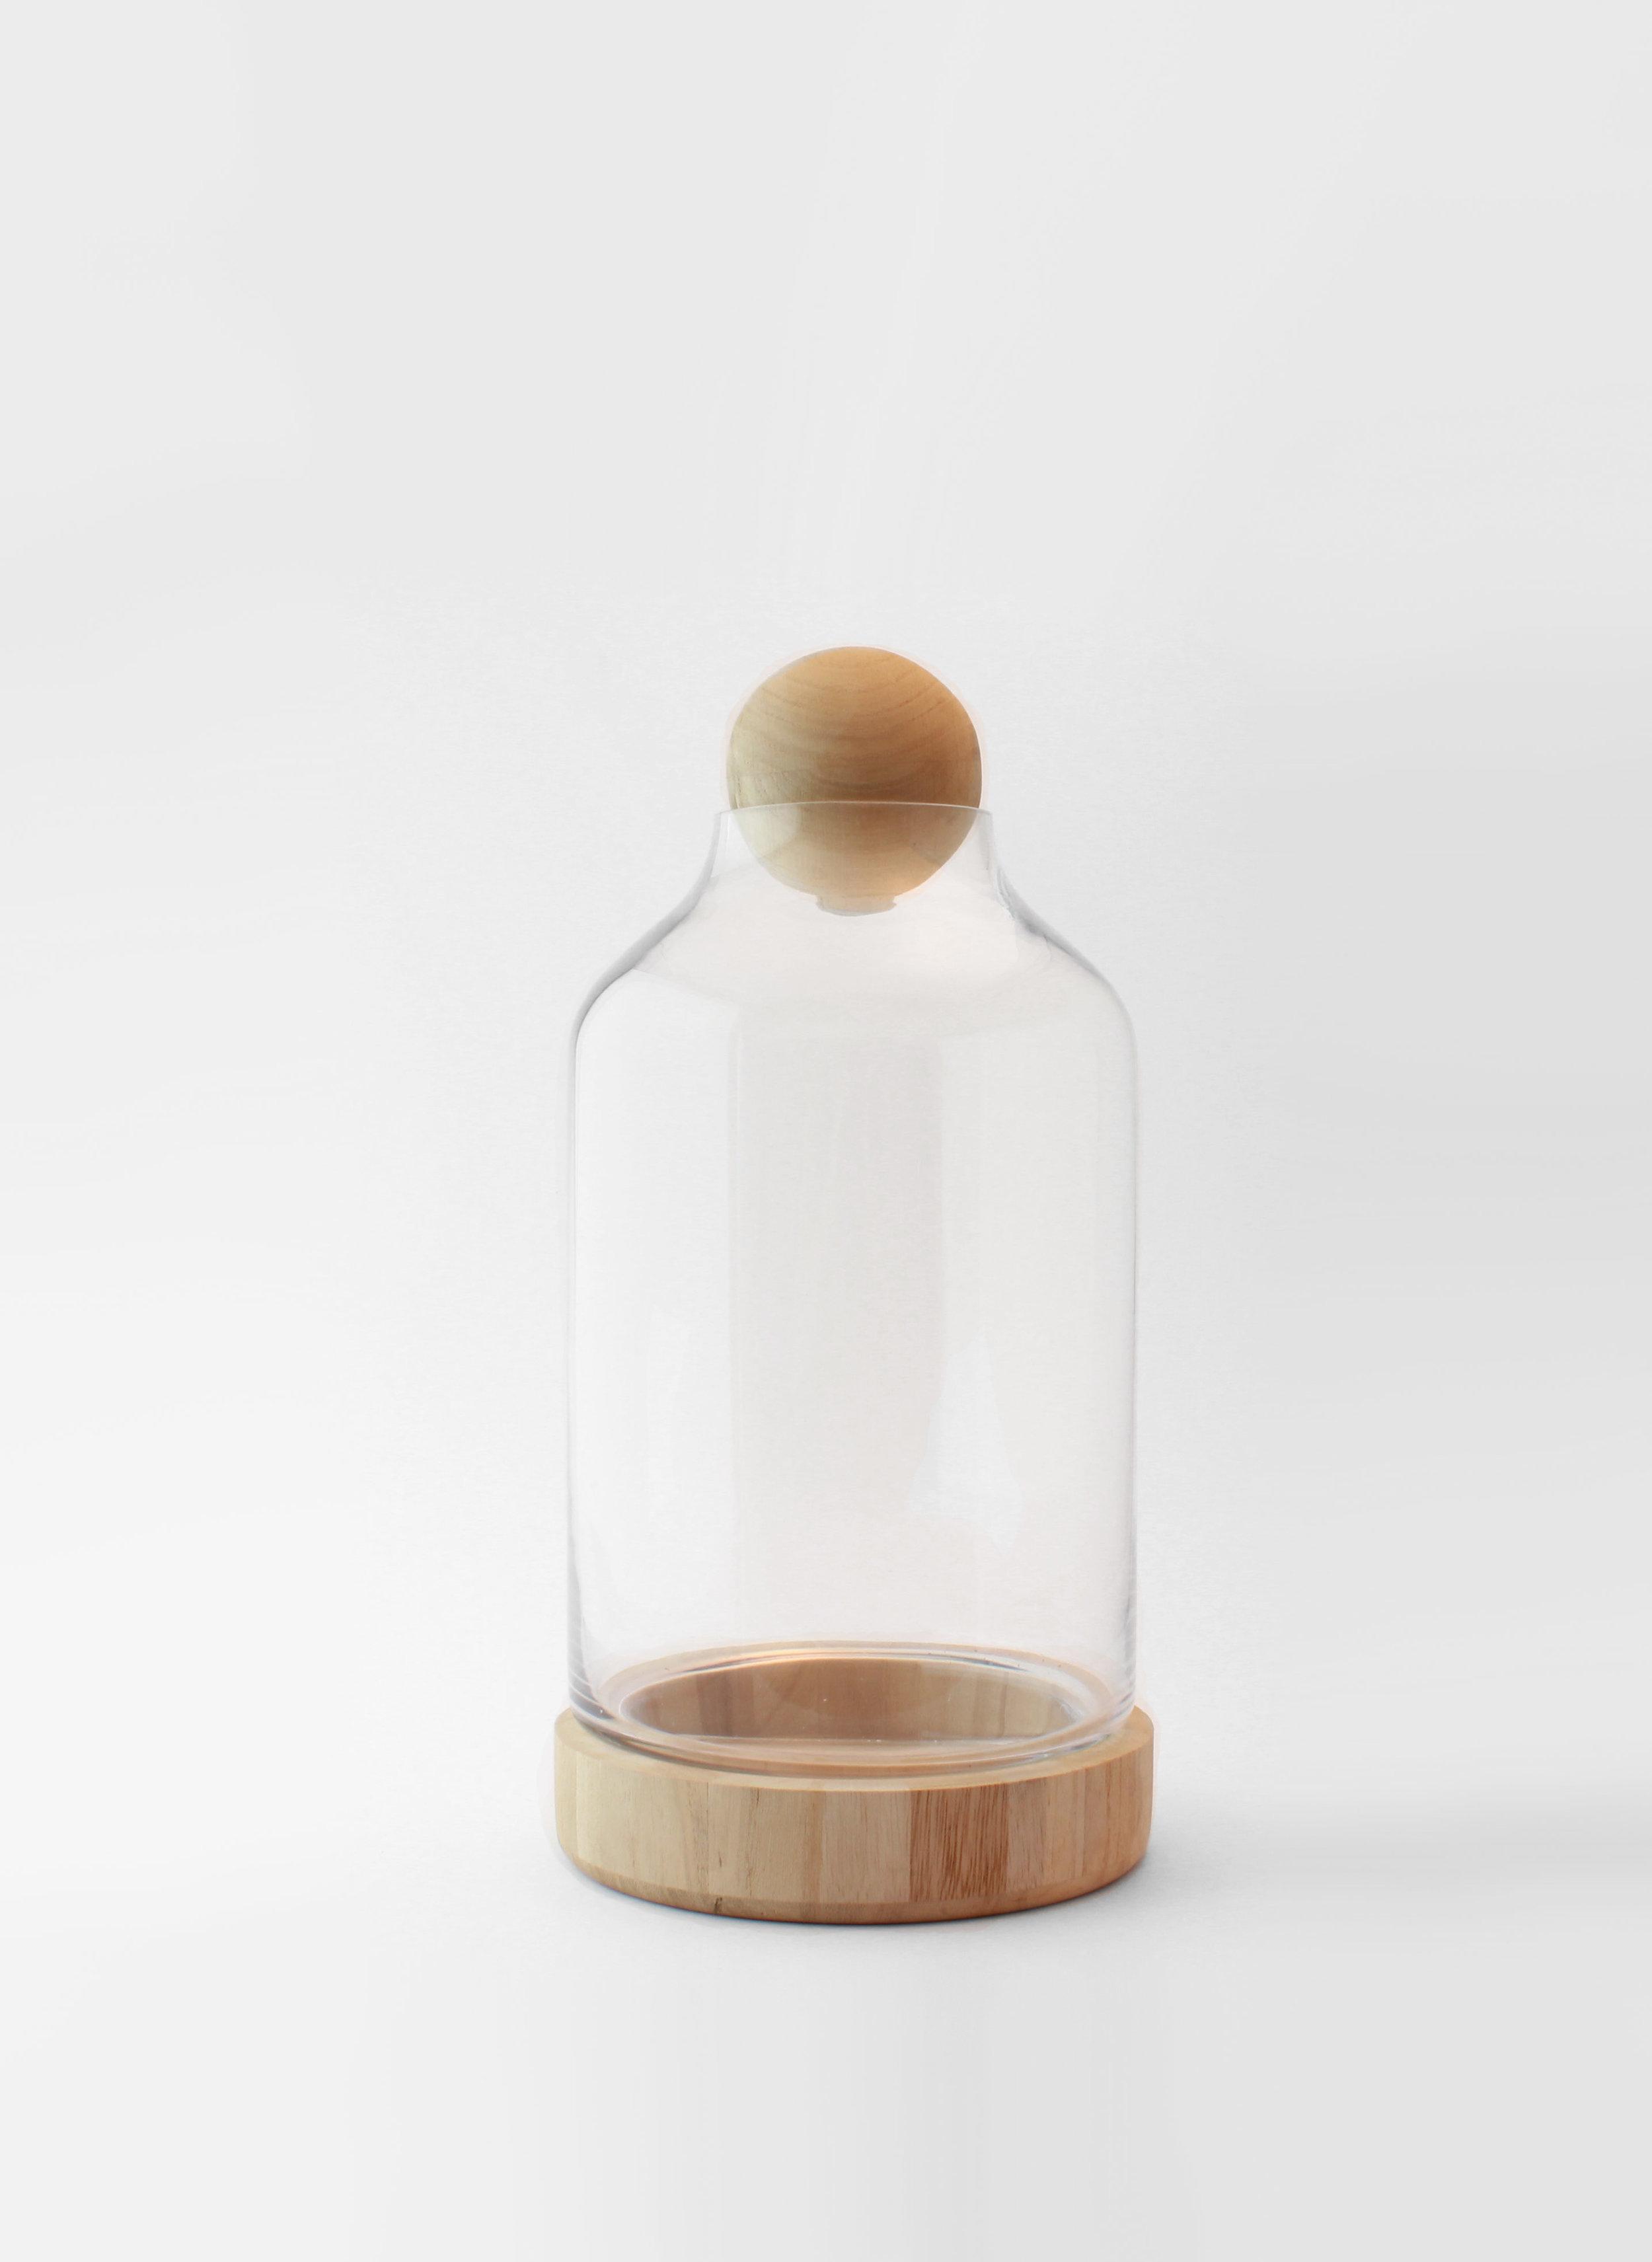 WOOD + GLASS TERRARIUM